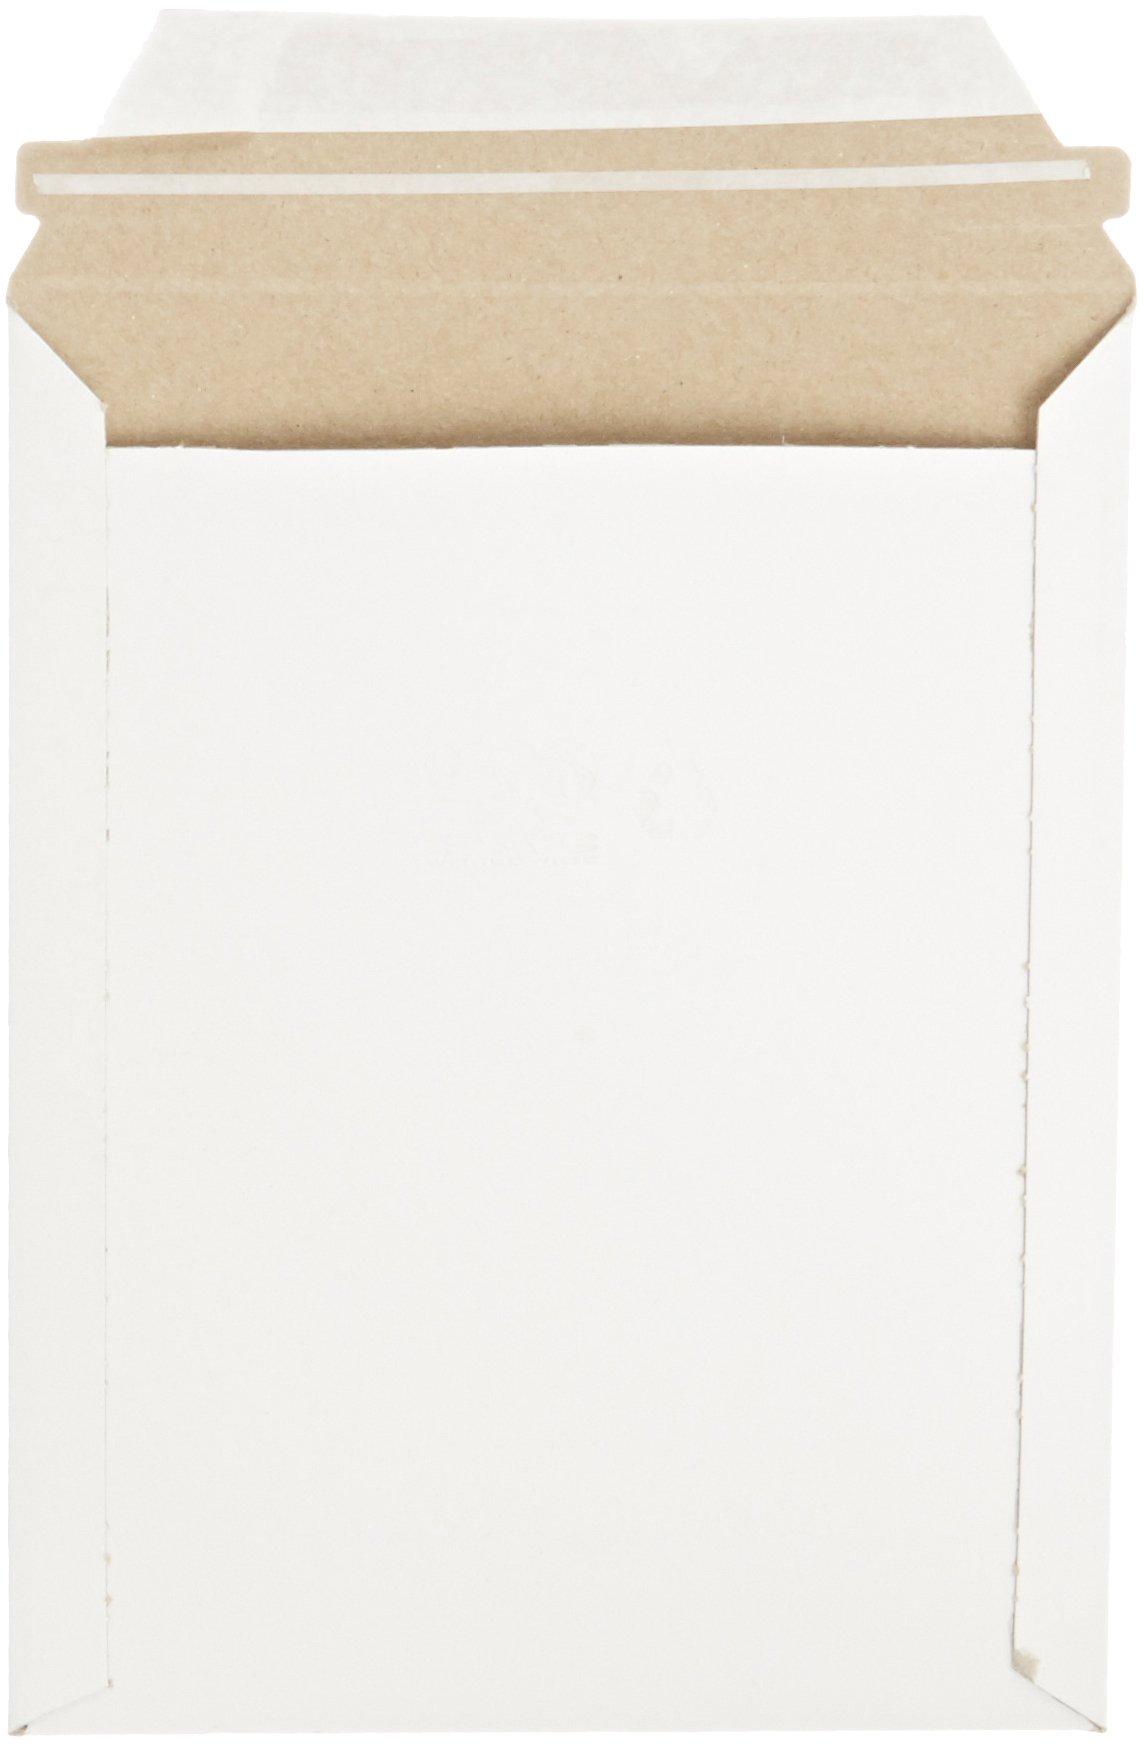 Pratt MJ-2 Self-Seal Stay Flat Mailer, White, 7'' x 9'' (Pack of 100) by Pratt